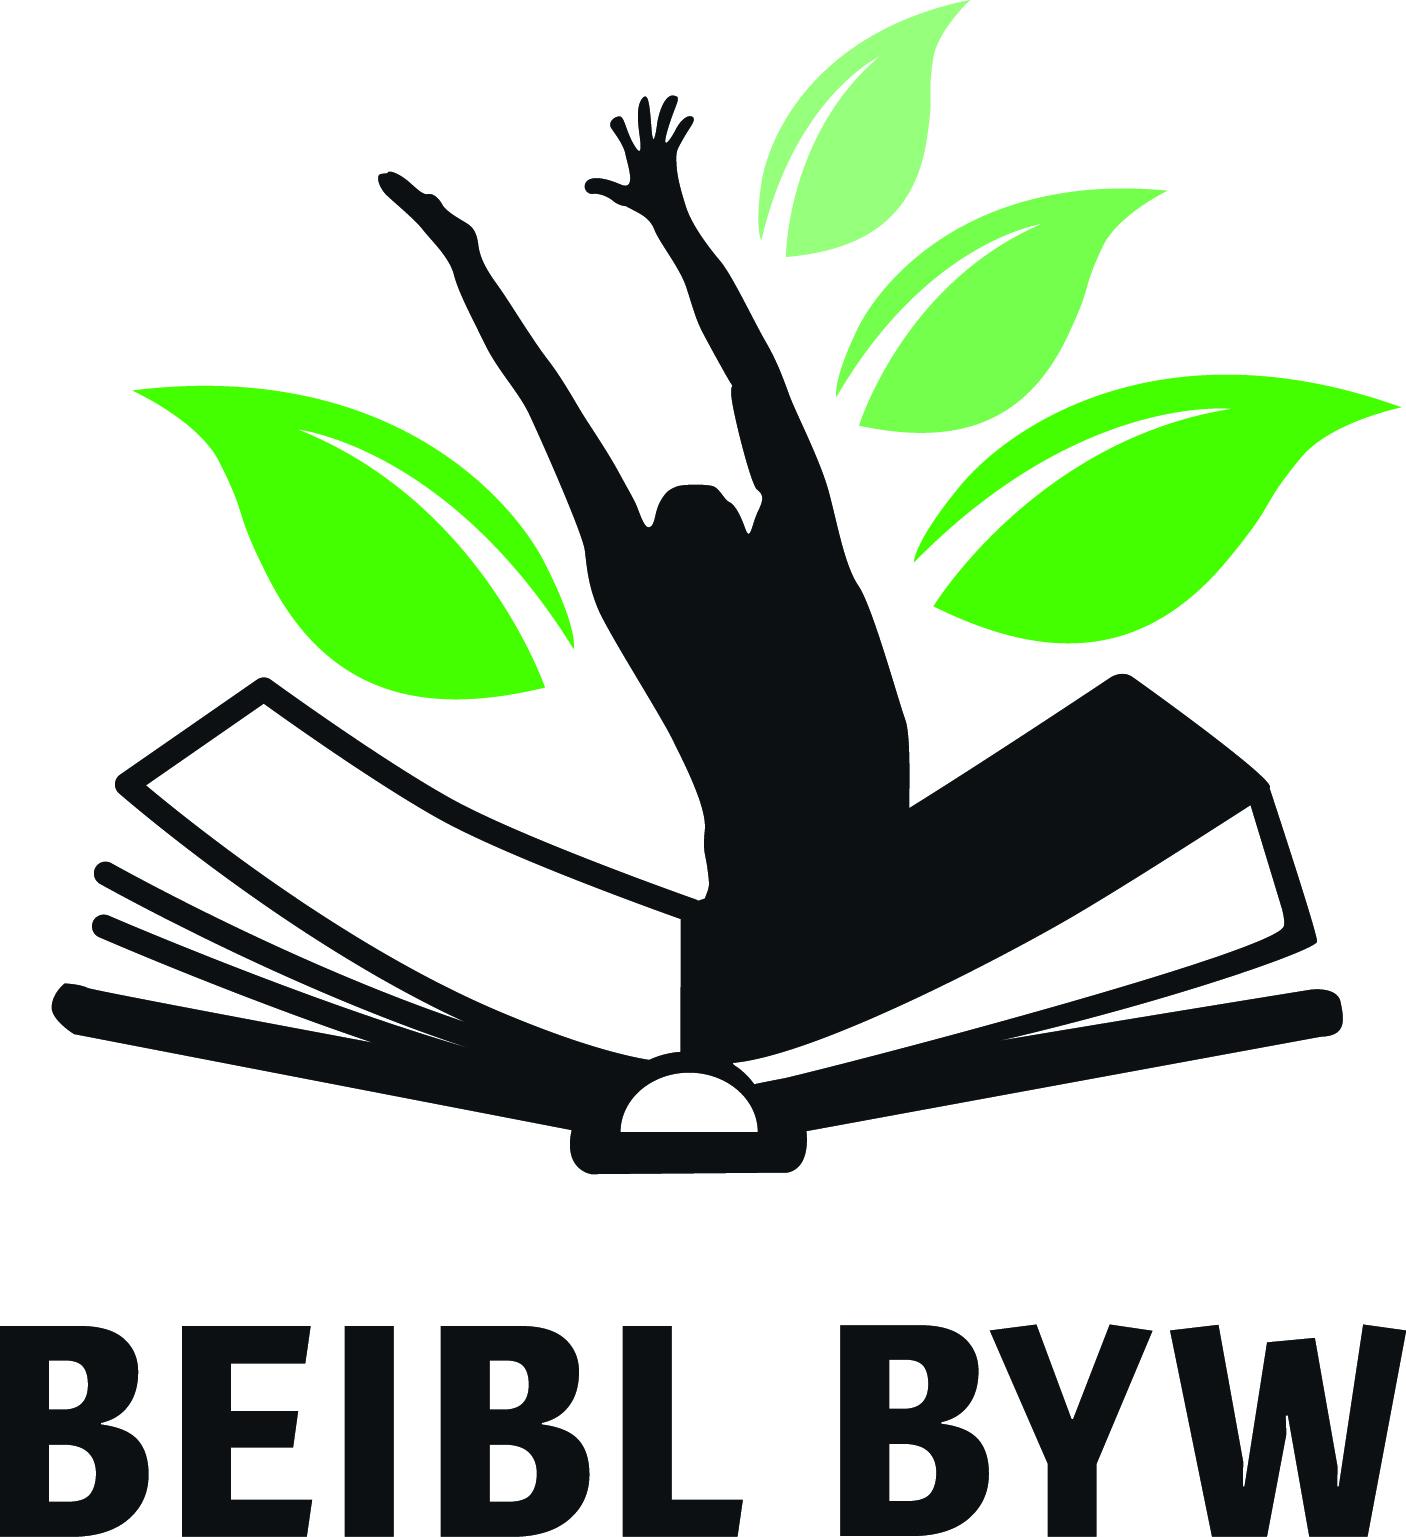 Beibl_Byw_colour